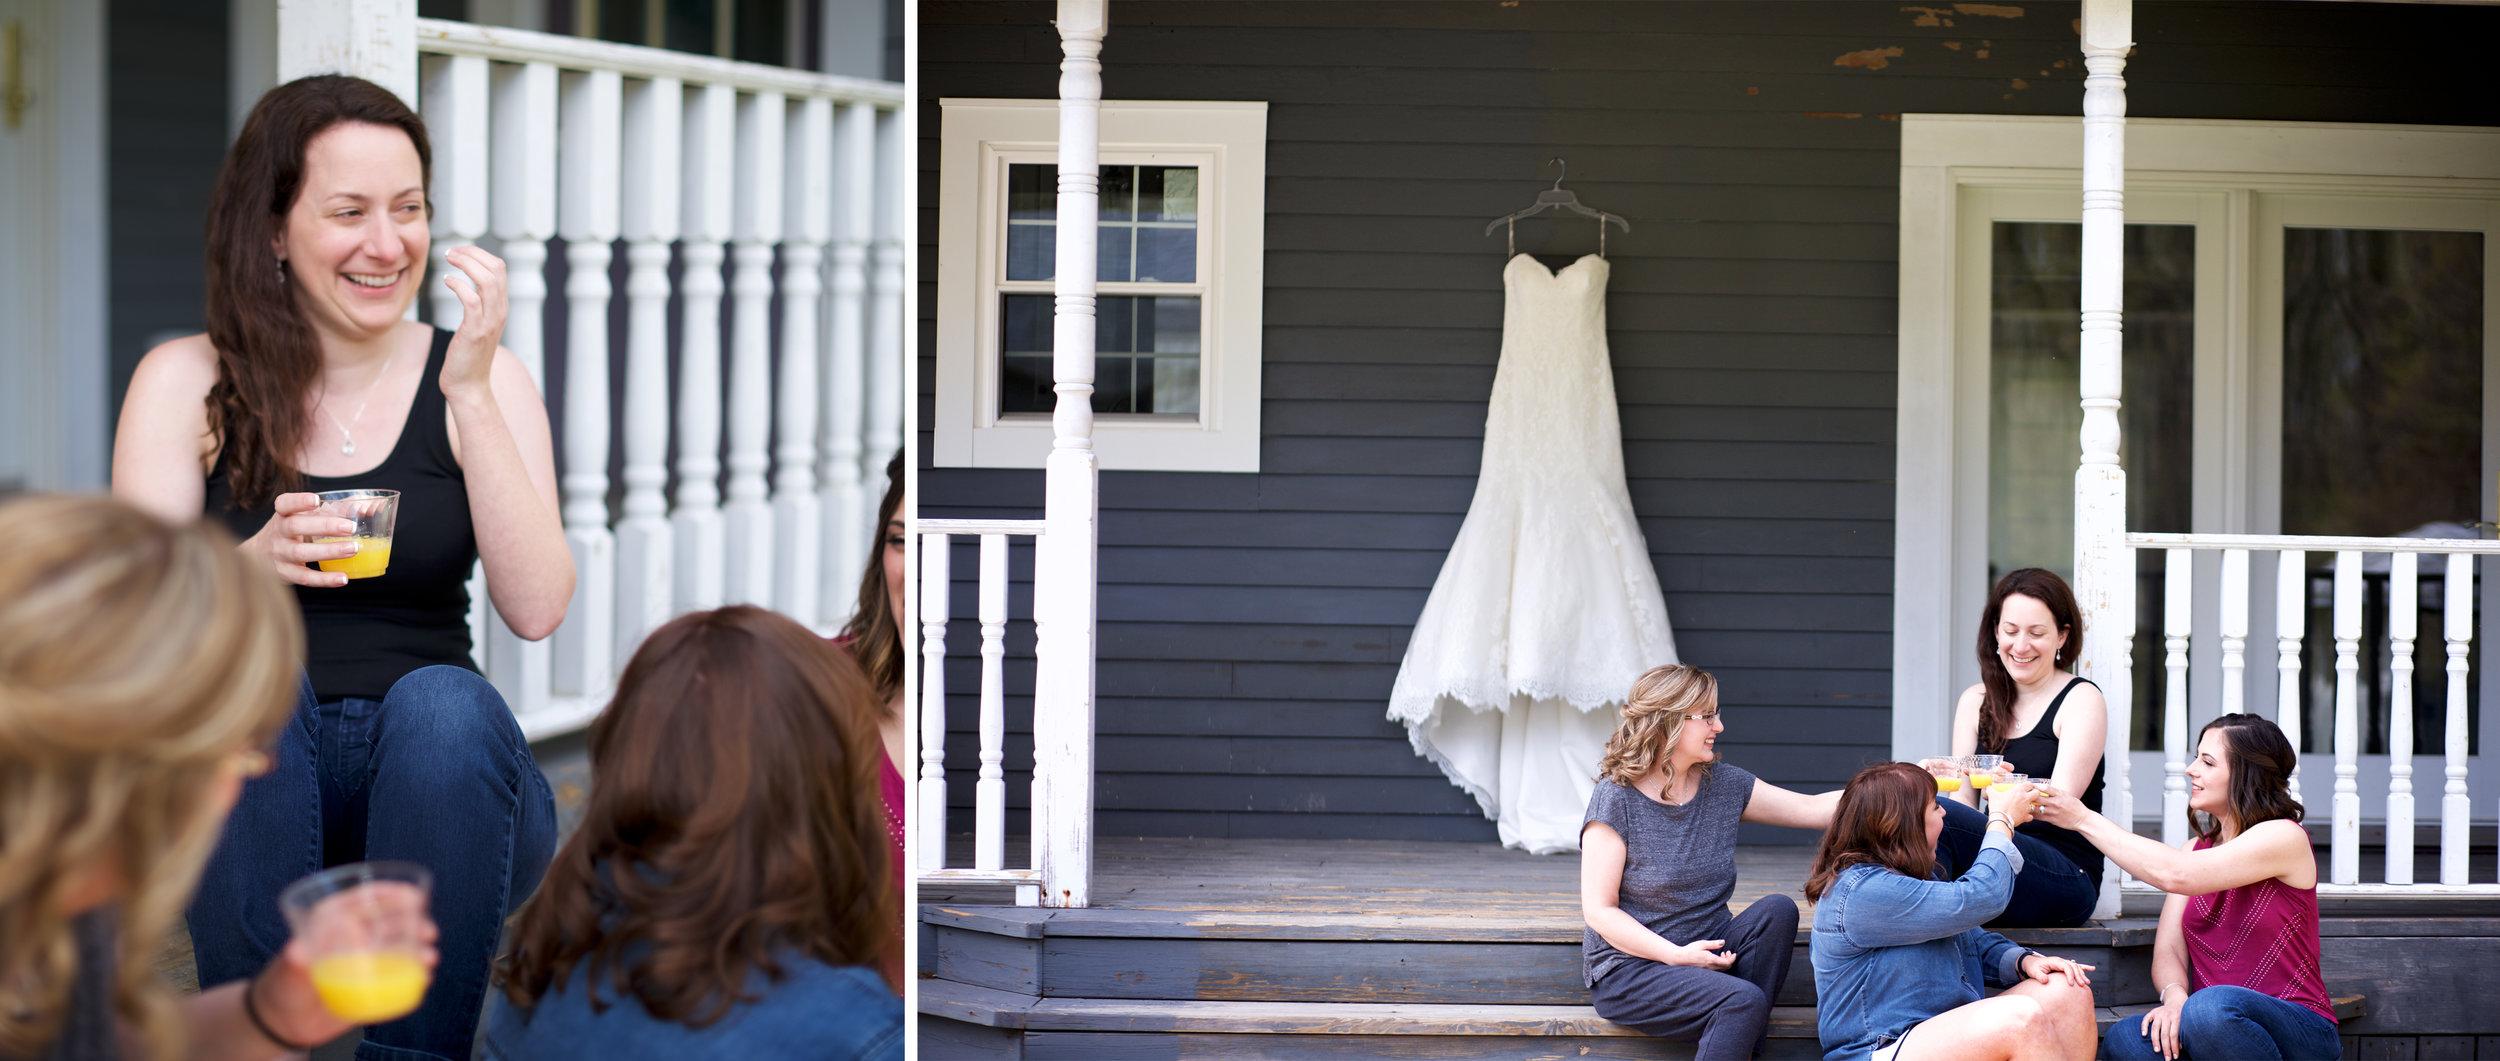 Lippincott manor wedding, wallkill ny wedding, photography, photos u.jpg